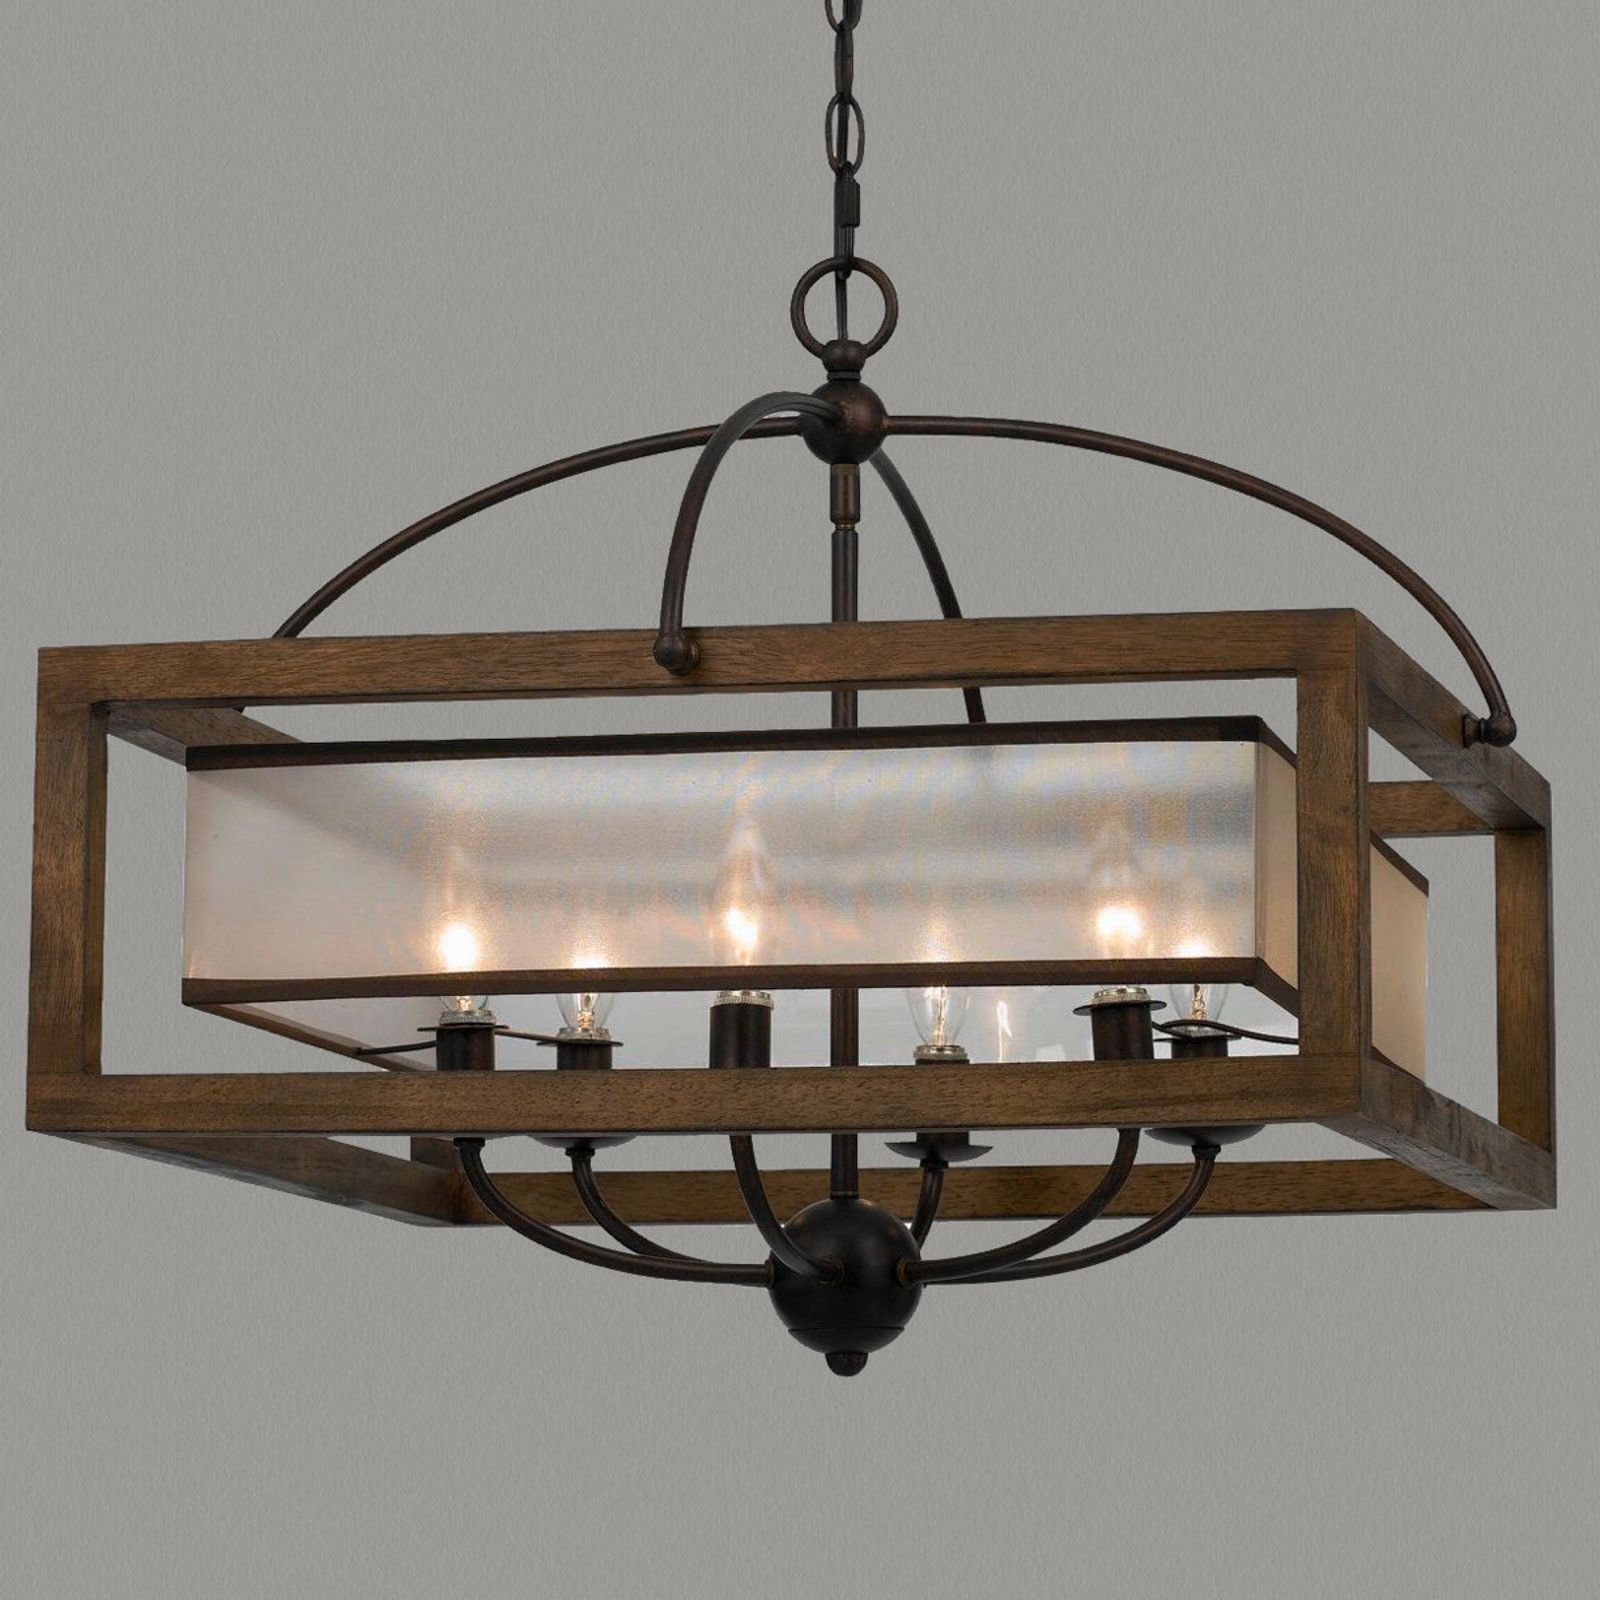 Square Wood Frame and Sheer Chandelier 6 Light